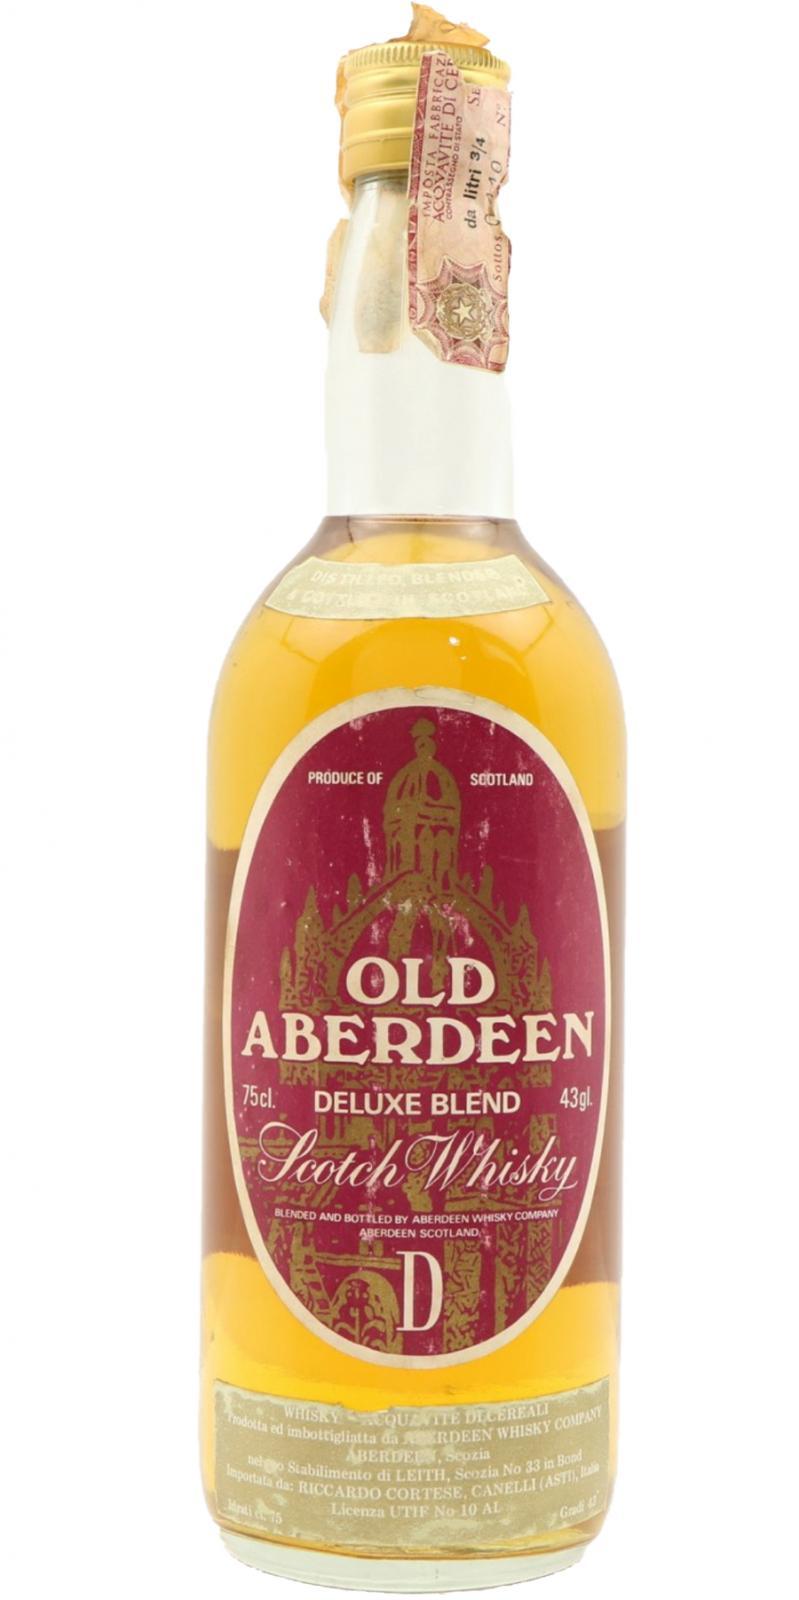 Old Aberdeen Deluxe Blend